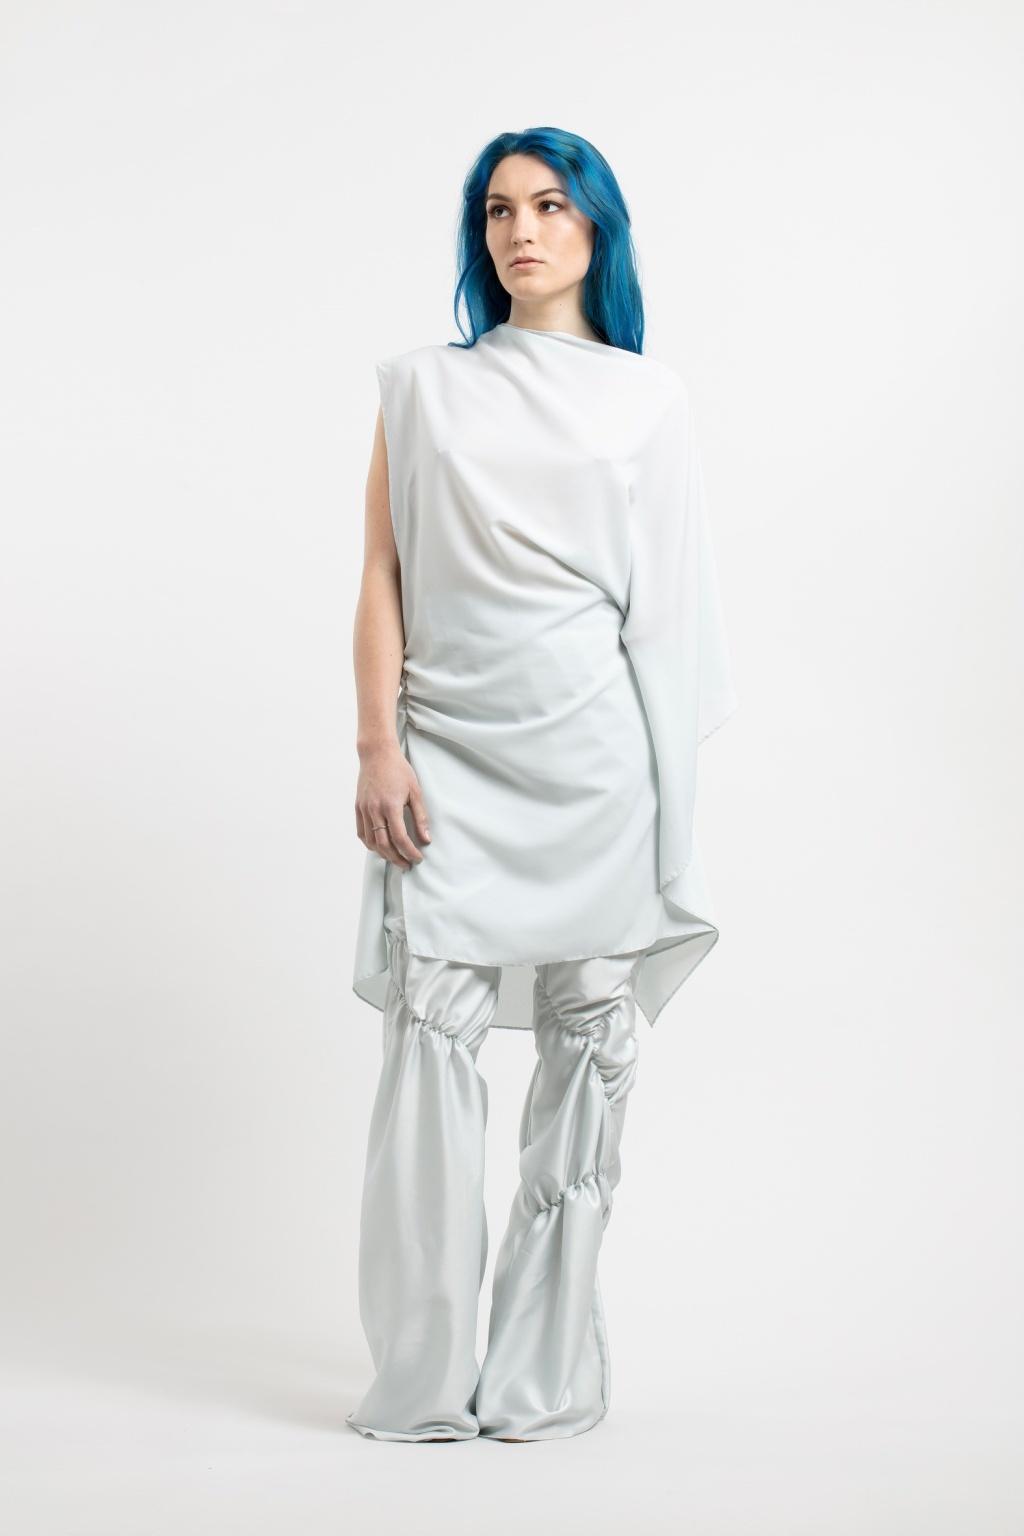 Unique Client - projekt Ateliéru designu oděvu a obuvi UMPRUM